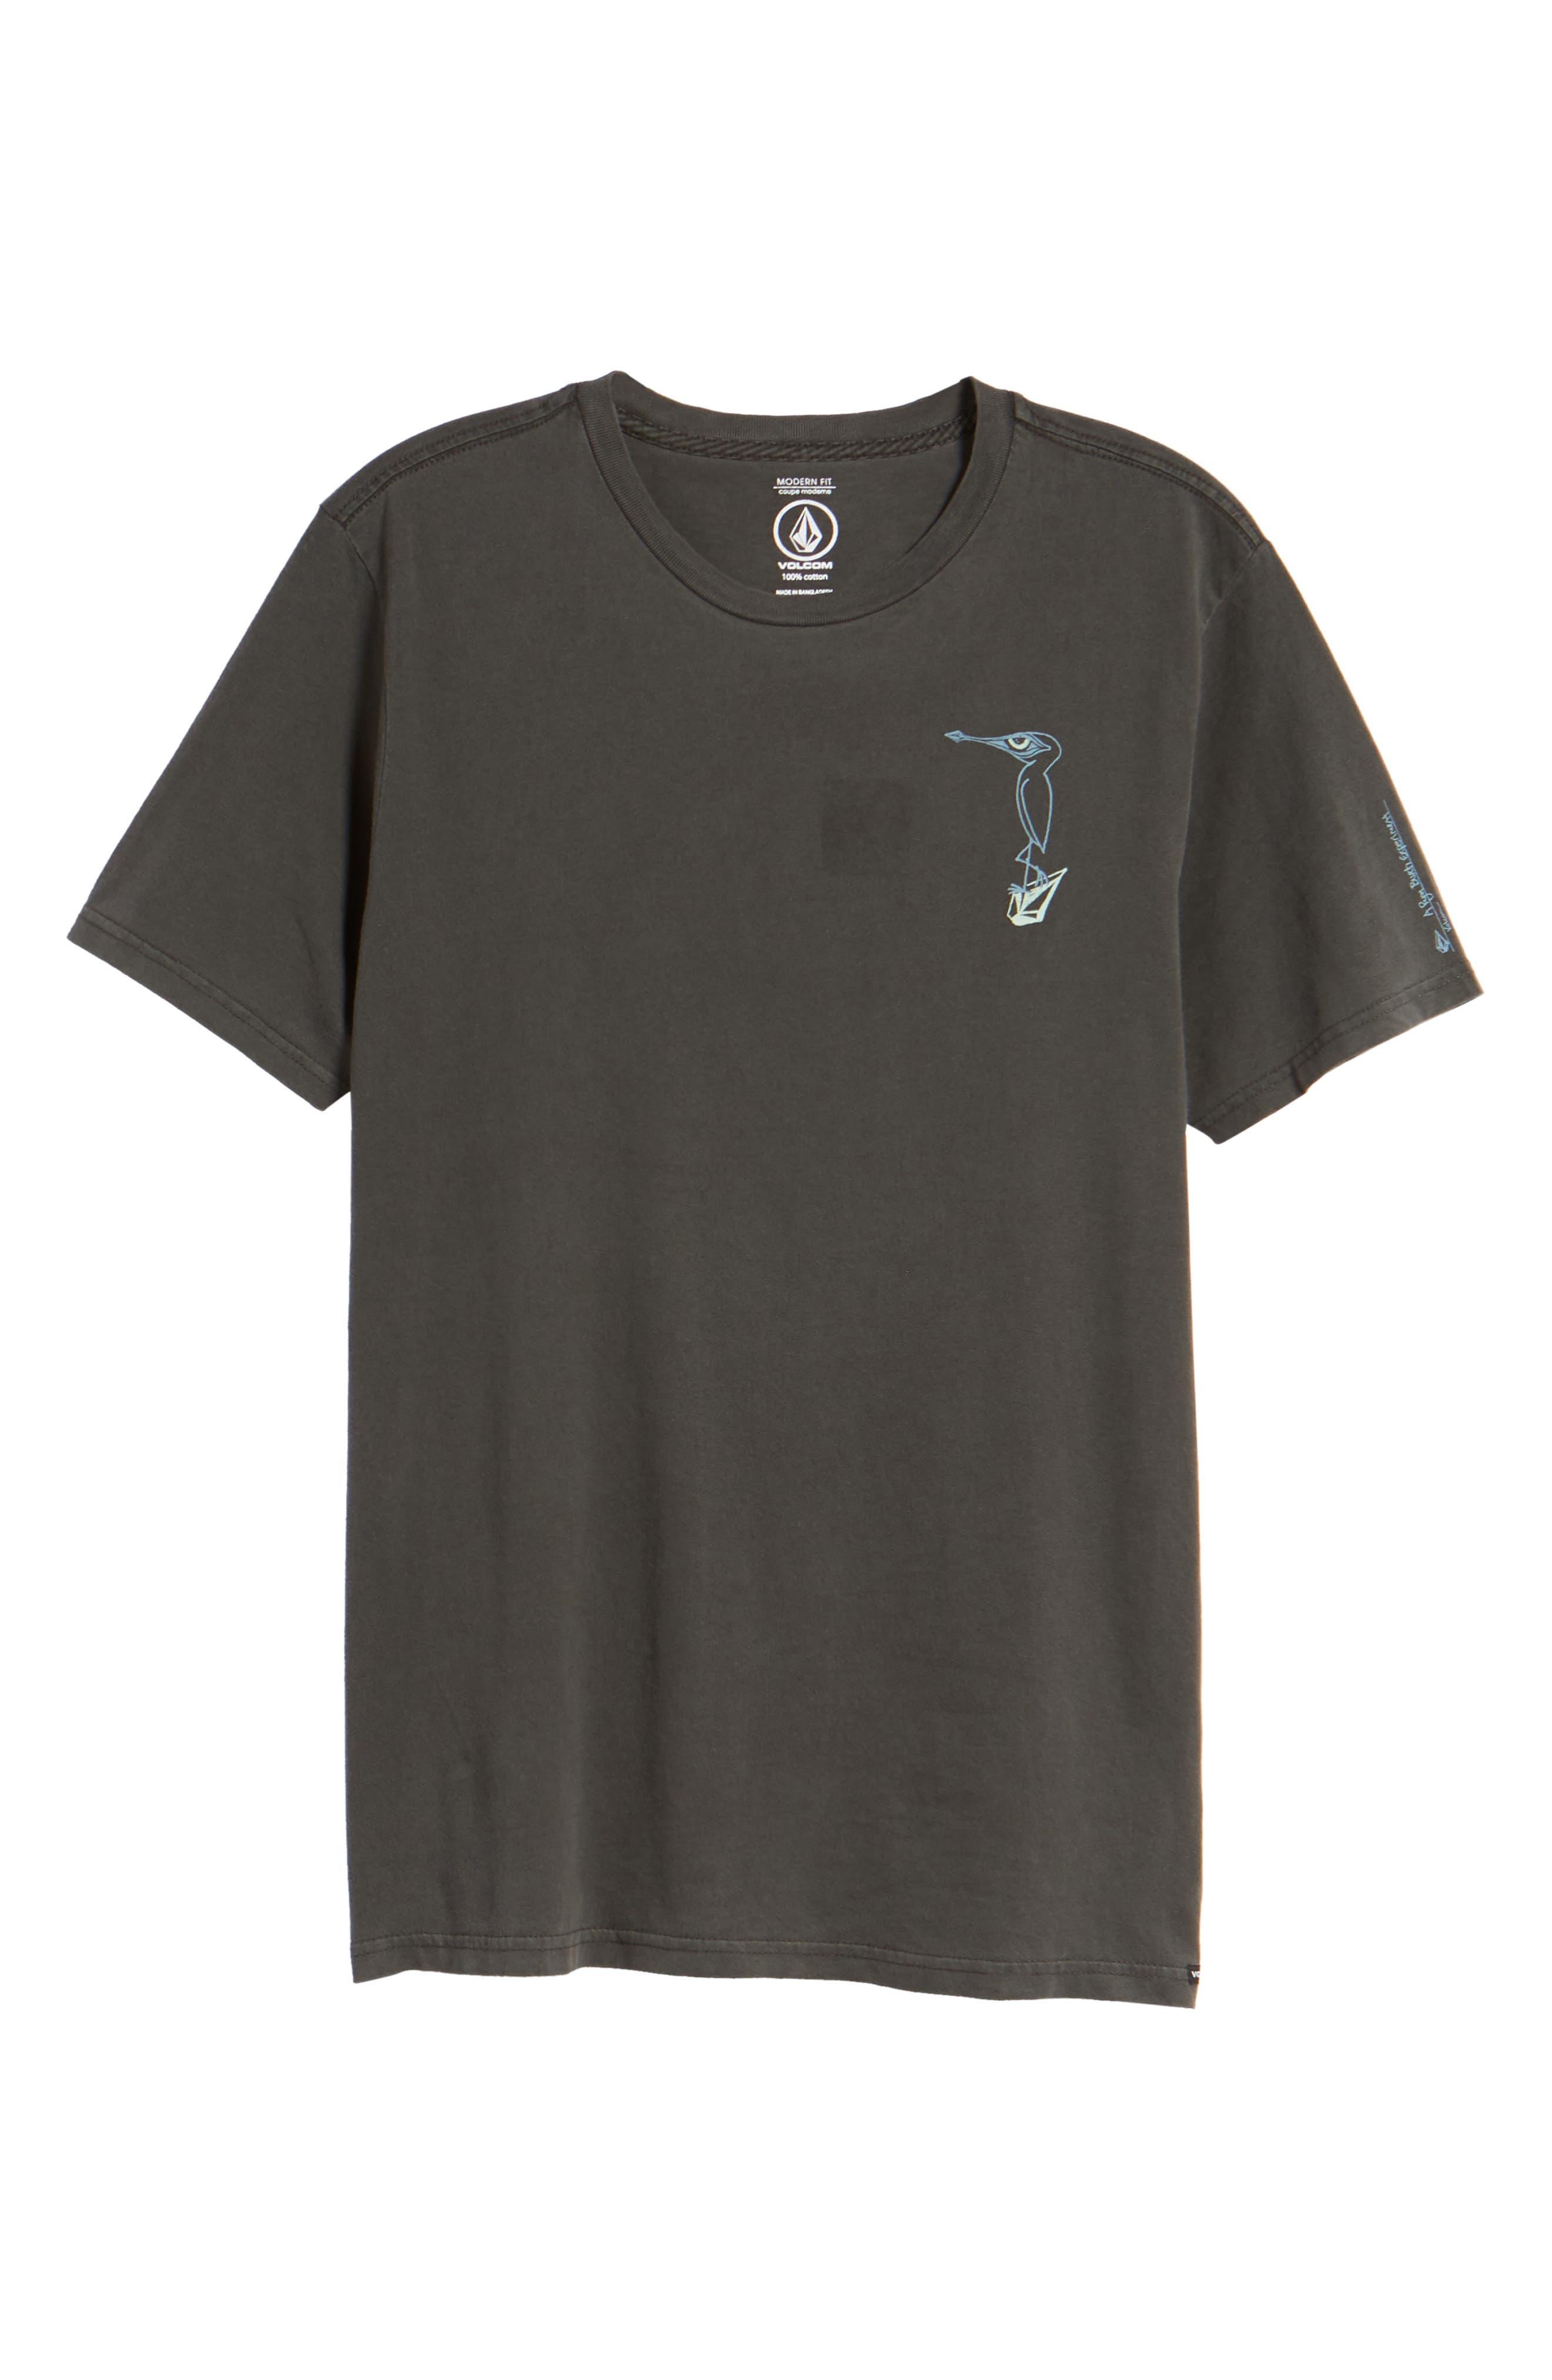 Burch Bird Graphic T-Shirt,                             Alternate thumbnail 6, color,